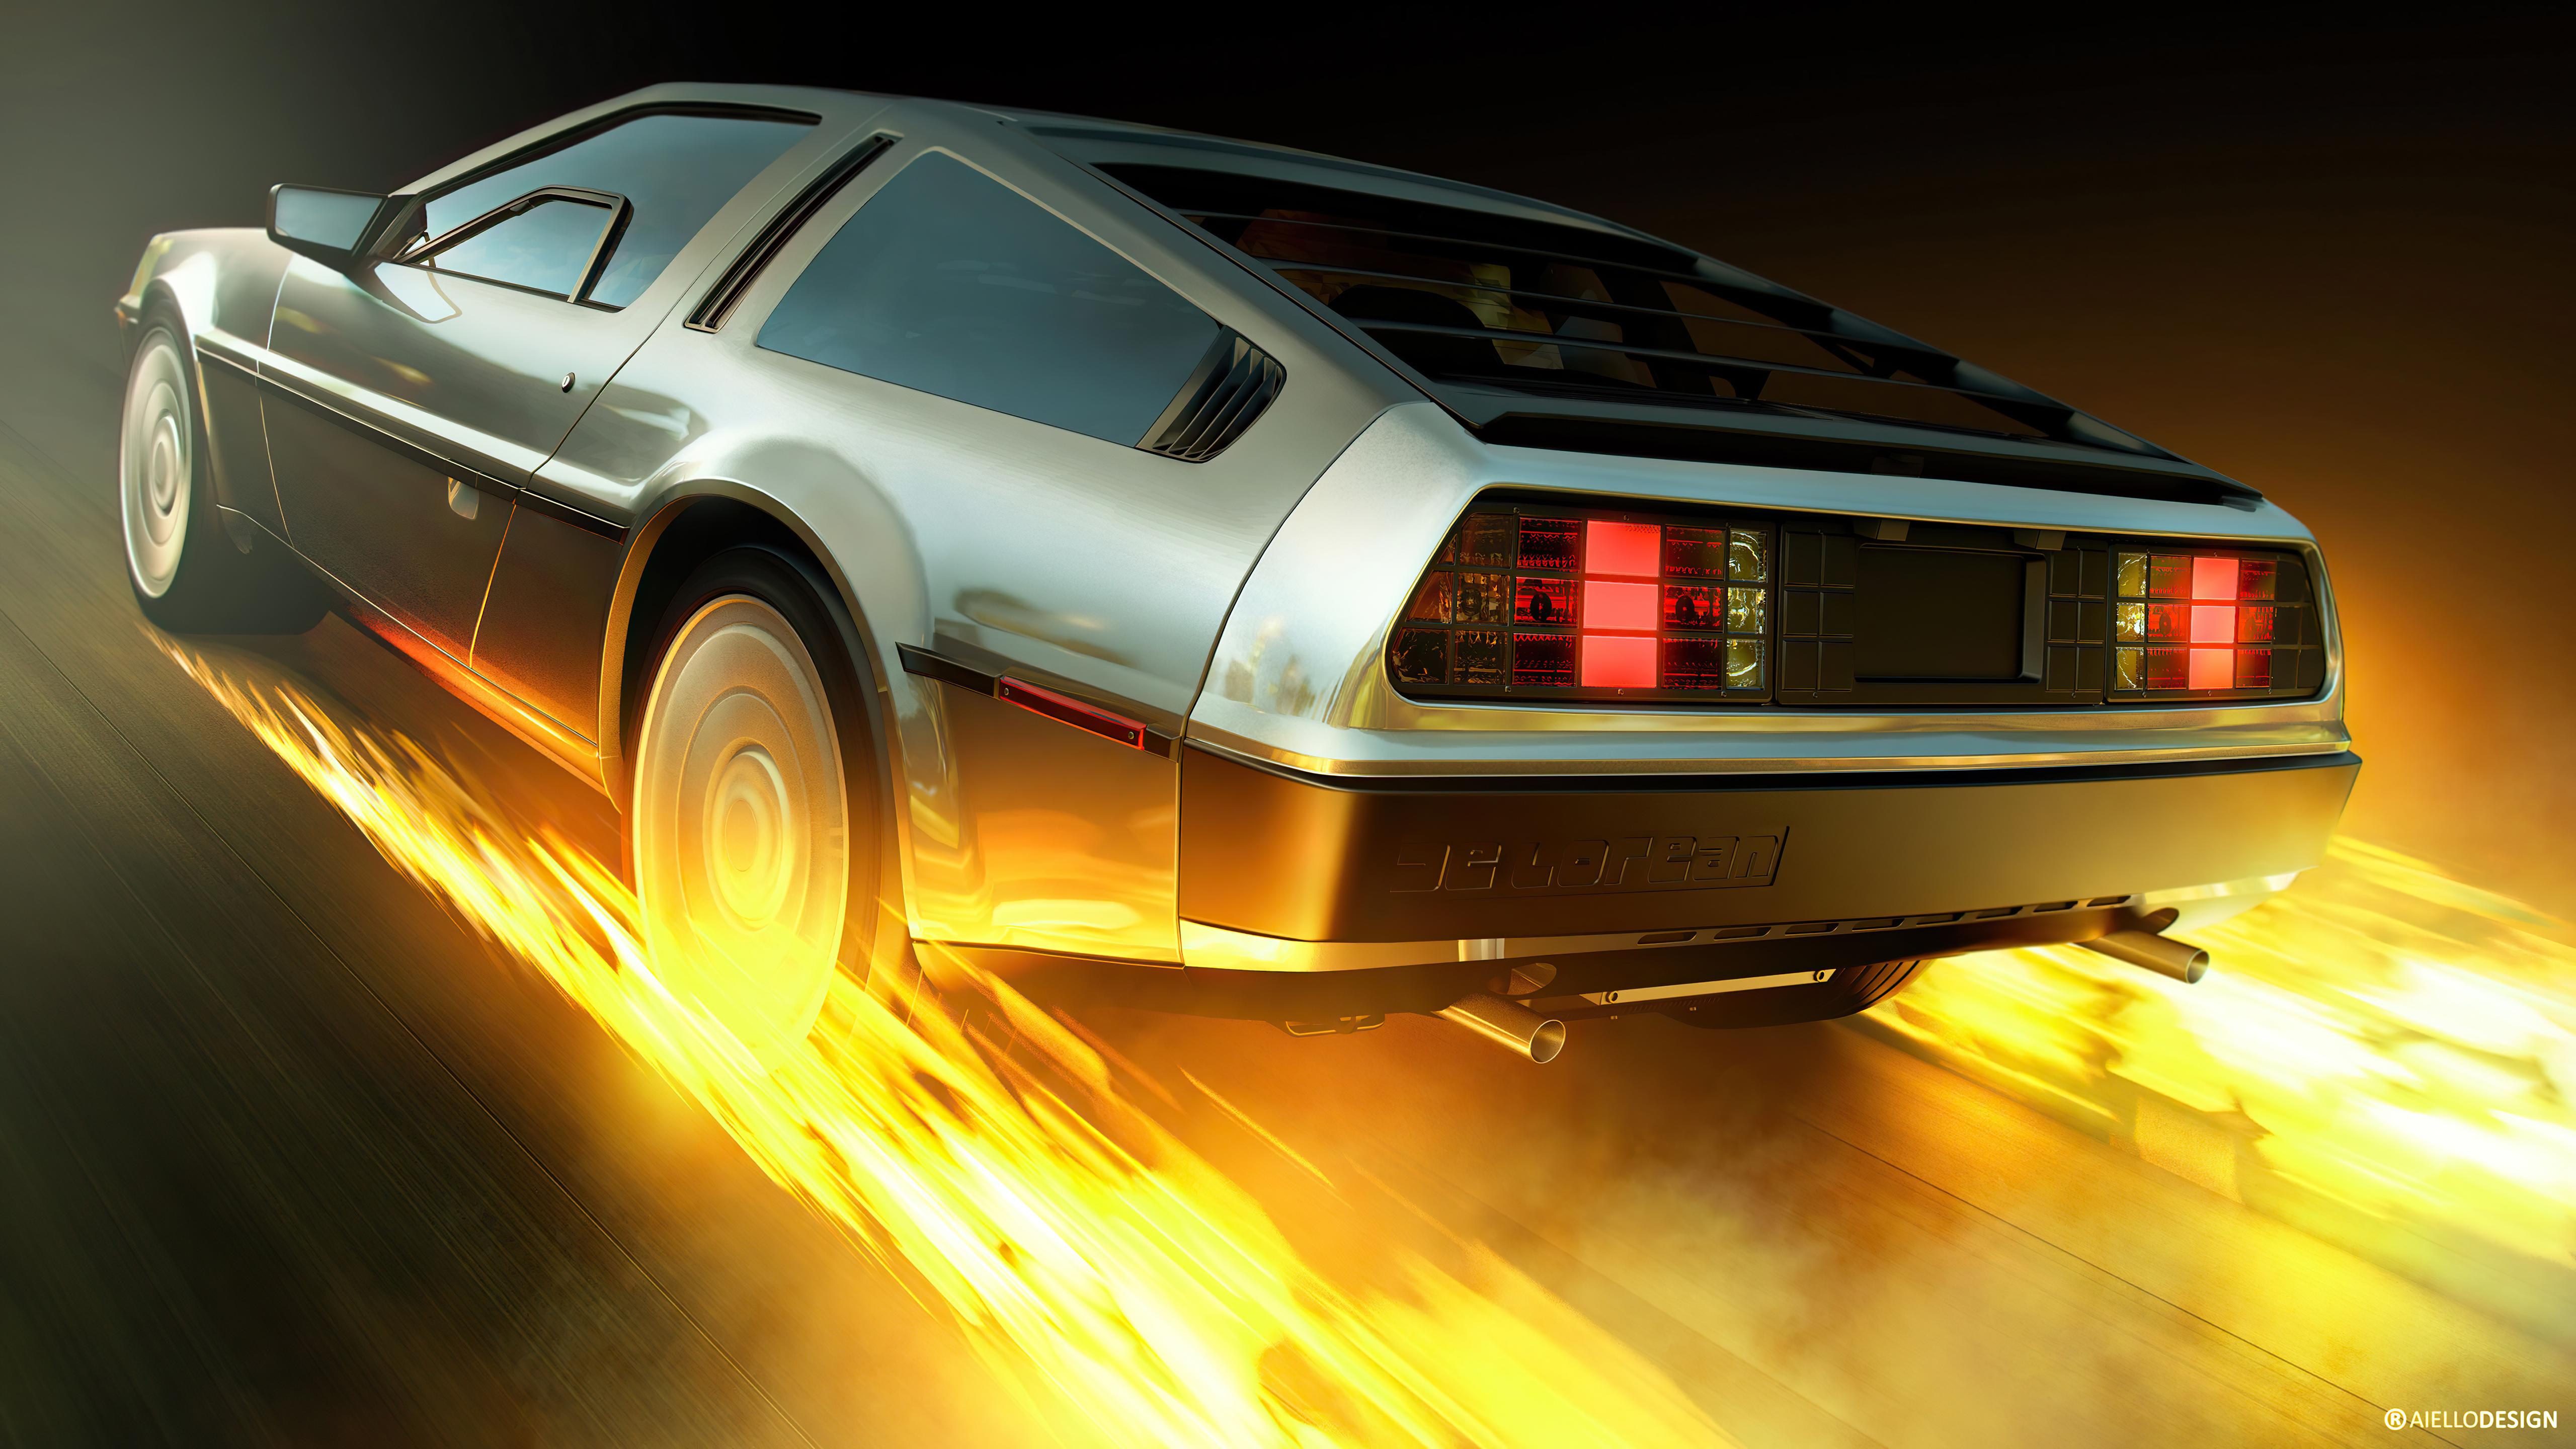 delorean burning wheels 4k 1620171763 - Delorean Burning Wheels 4k - Delorean Burning Wheels 4k wallpapers